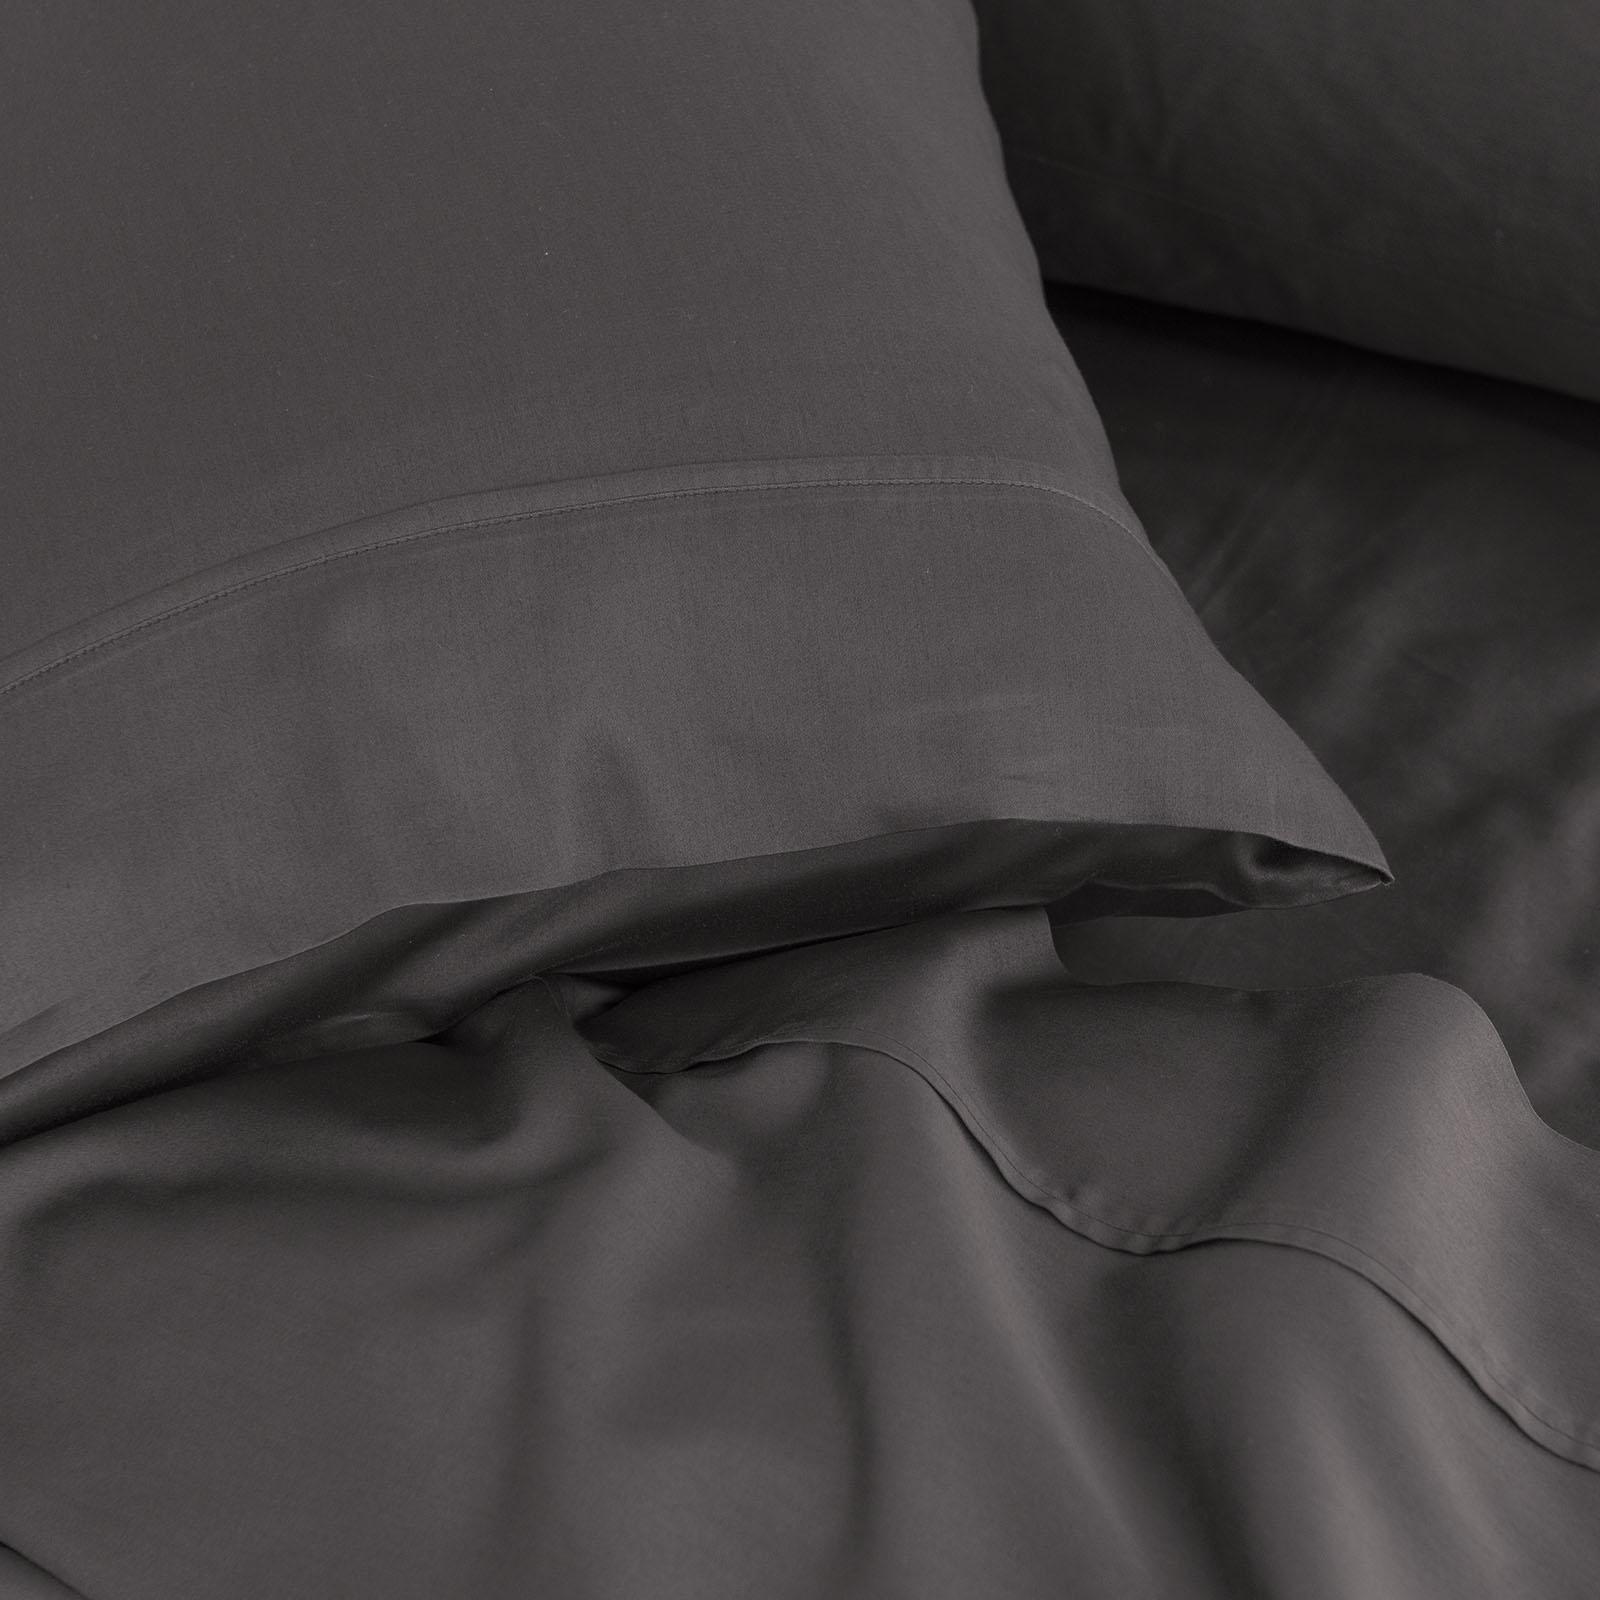 thumbnail 64 - Royal Comfort 1000TC Hotel Grade Bamboo Cotton Sheets Pillowcases Set Ultrasoft